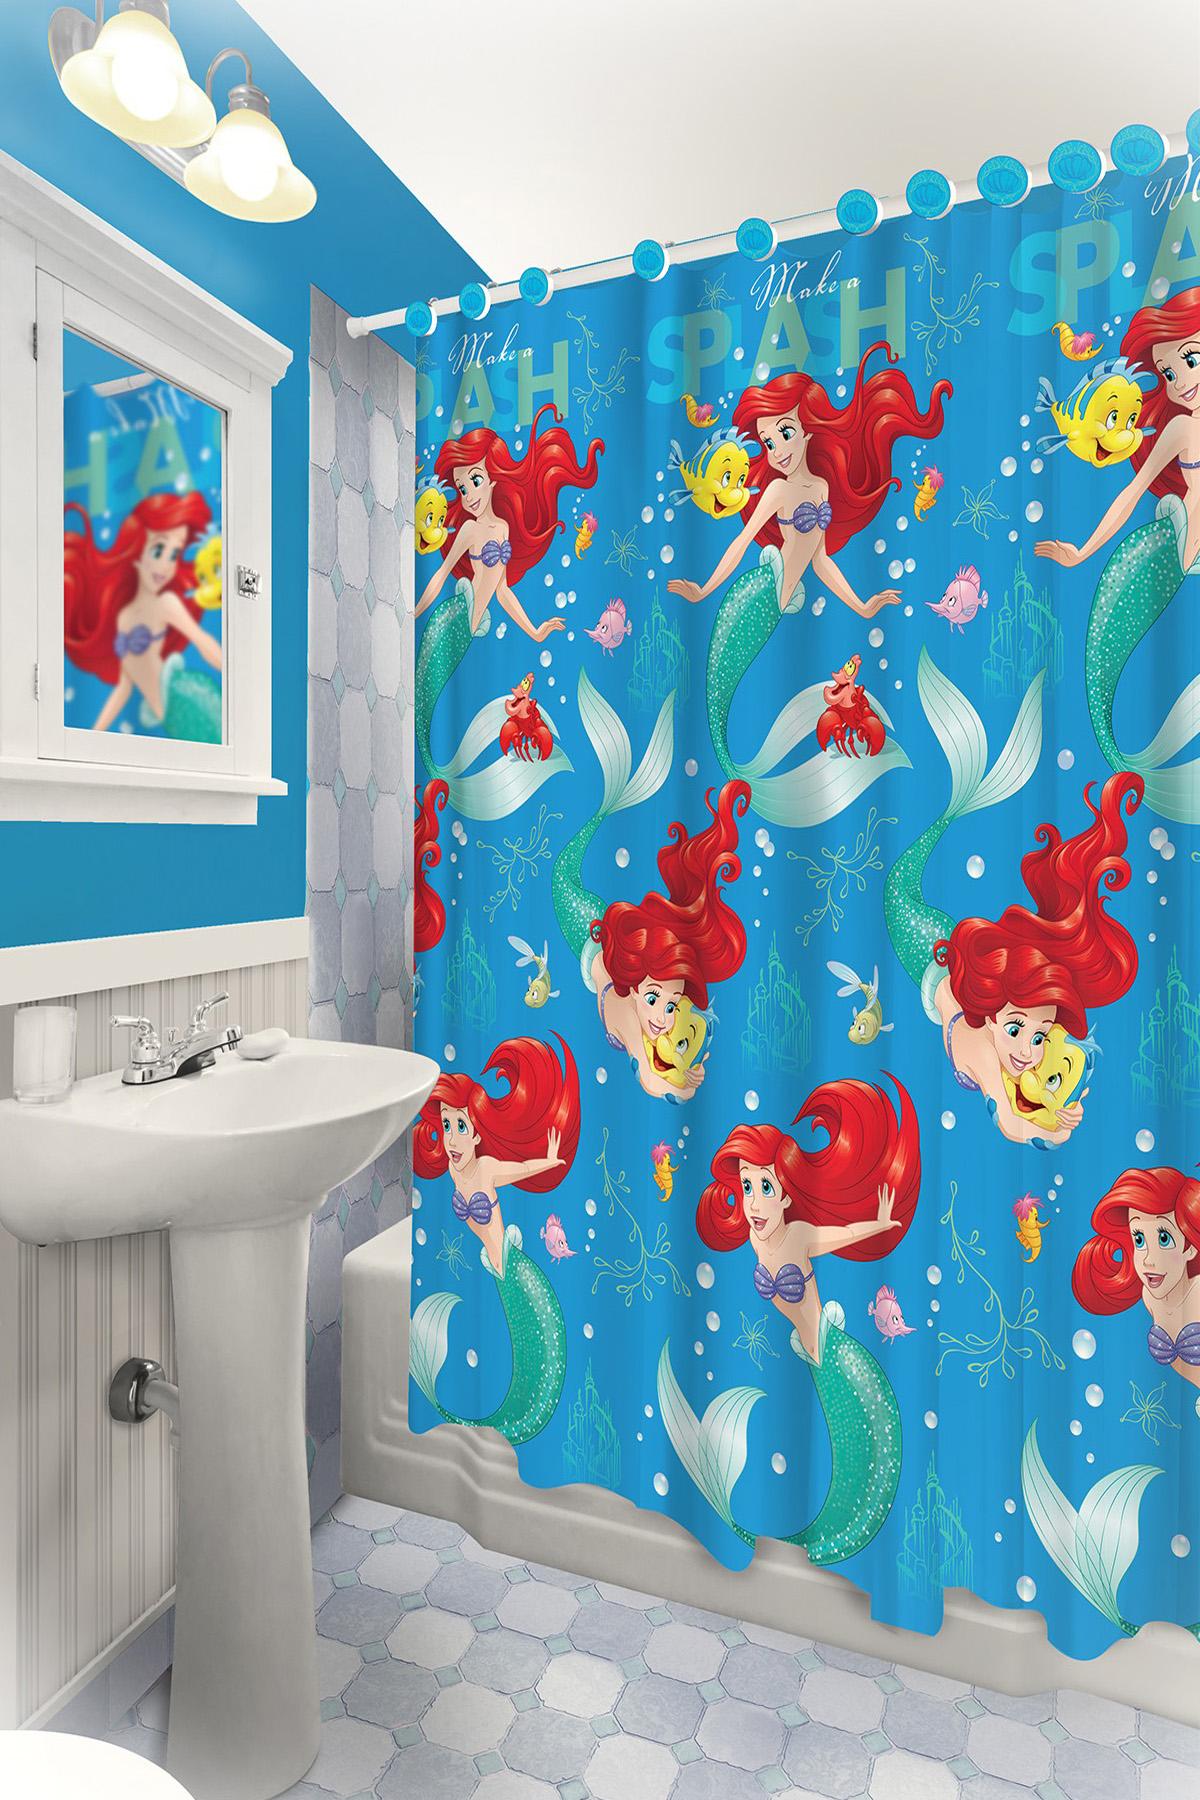 Details About 13pc Disney Ariel Little Mermaid Shower Curtain And Hooks Set